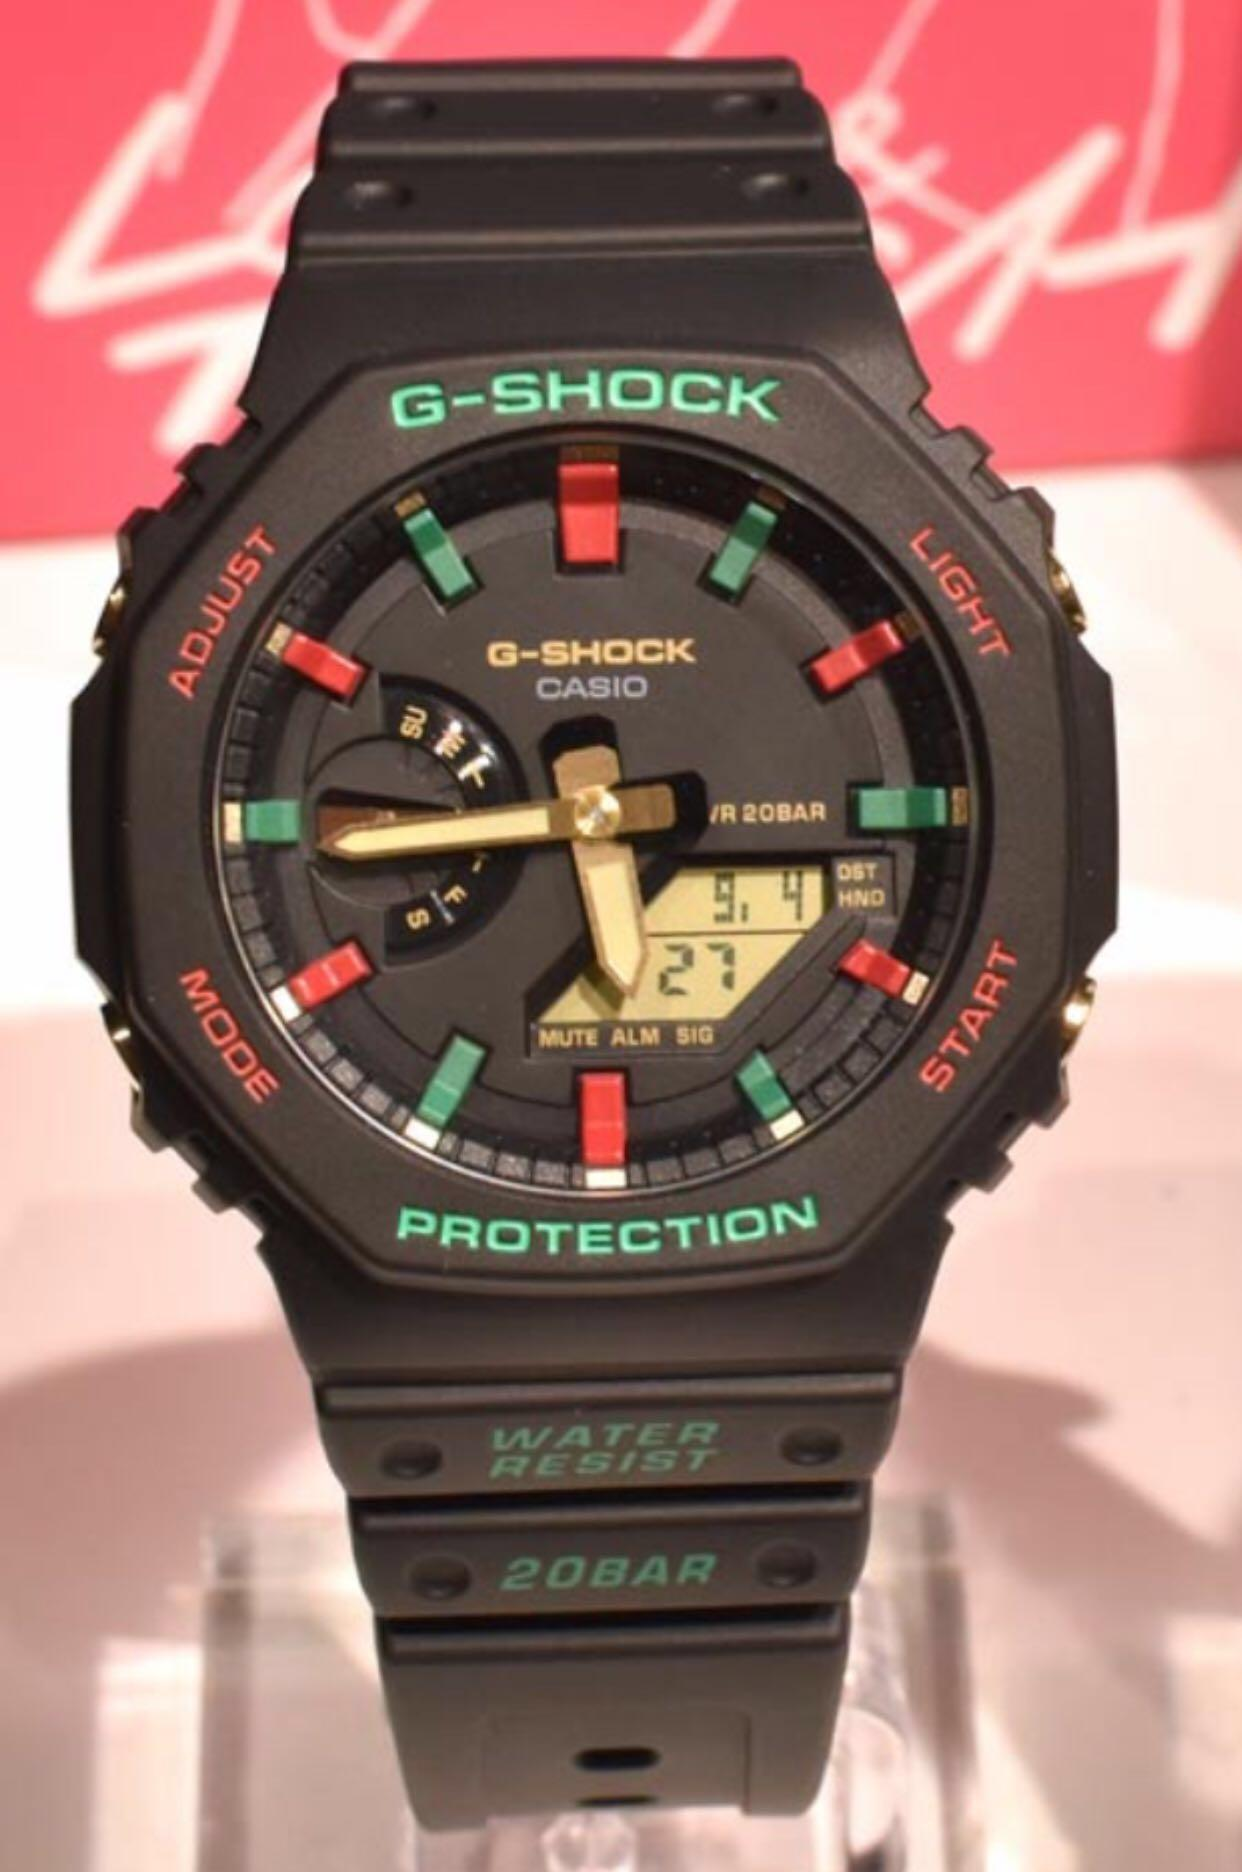 NEW🌟EDITION : GSHOCK UNISEX DIVER SPORTS WATCH : 100% ORIGINAL AUTHENTIC CASIO G-SHOCK : GA-21000TH-1ADR / GA-21000TH-1A / GA-2100-1A